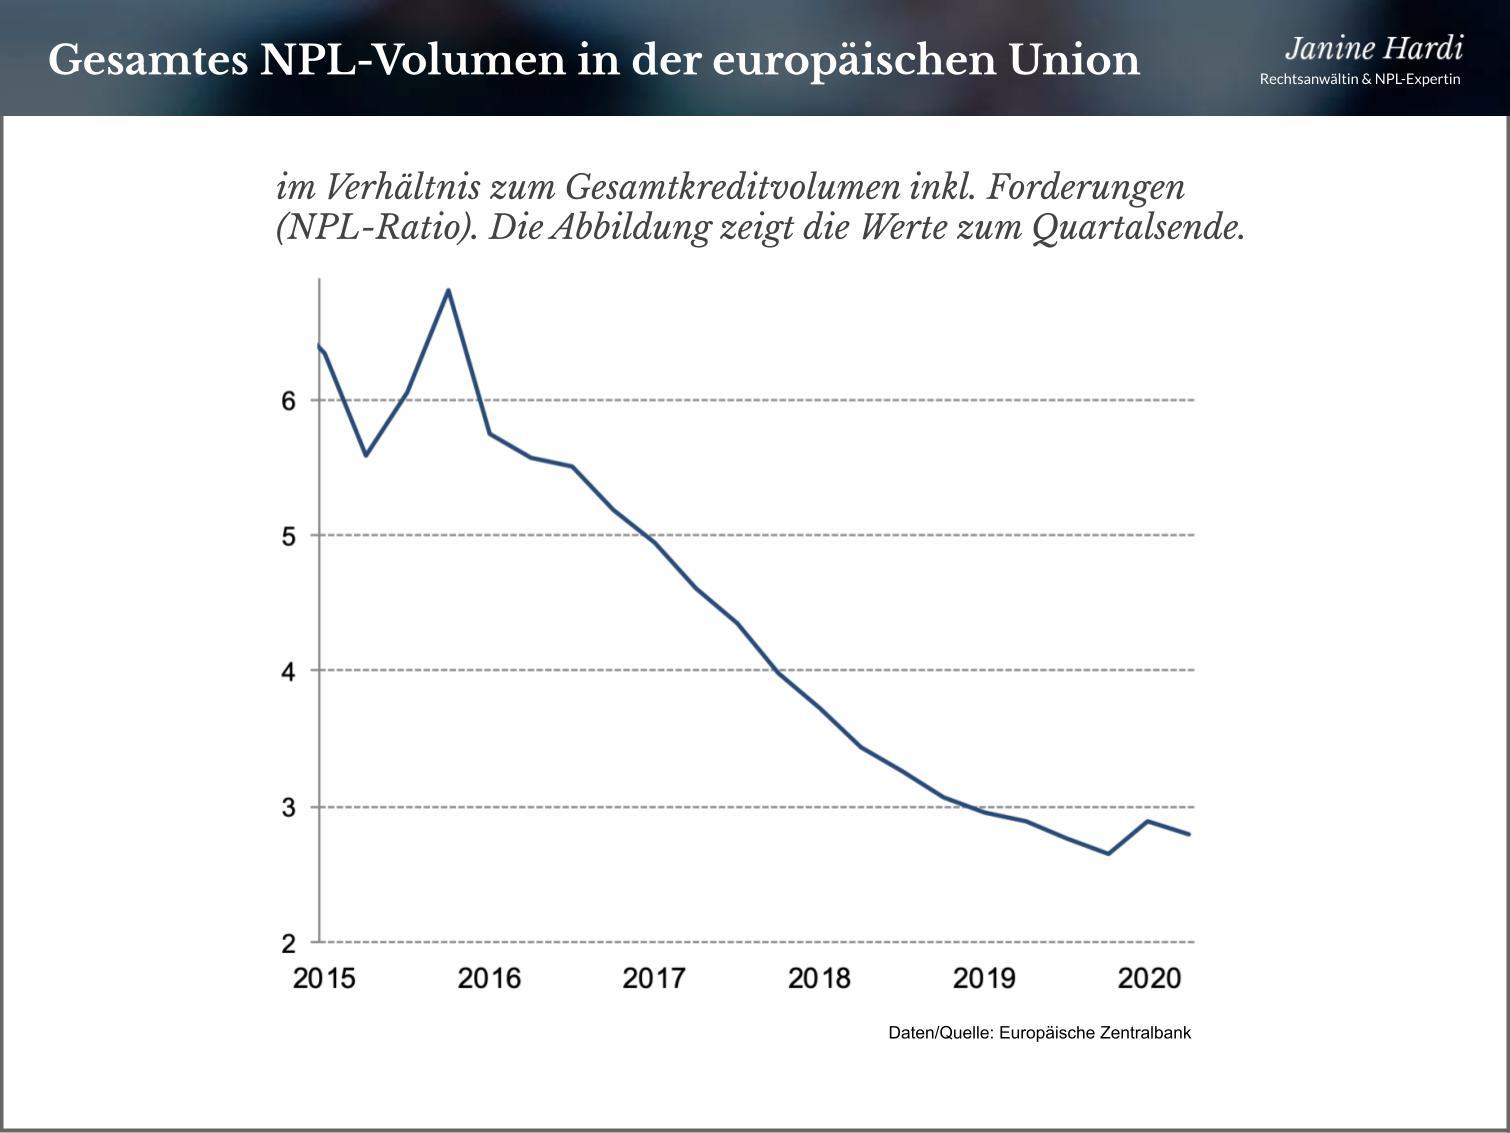 npl-ratio-eu-bad-banks-janine-hardi